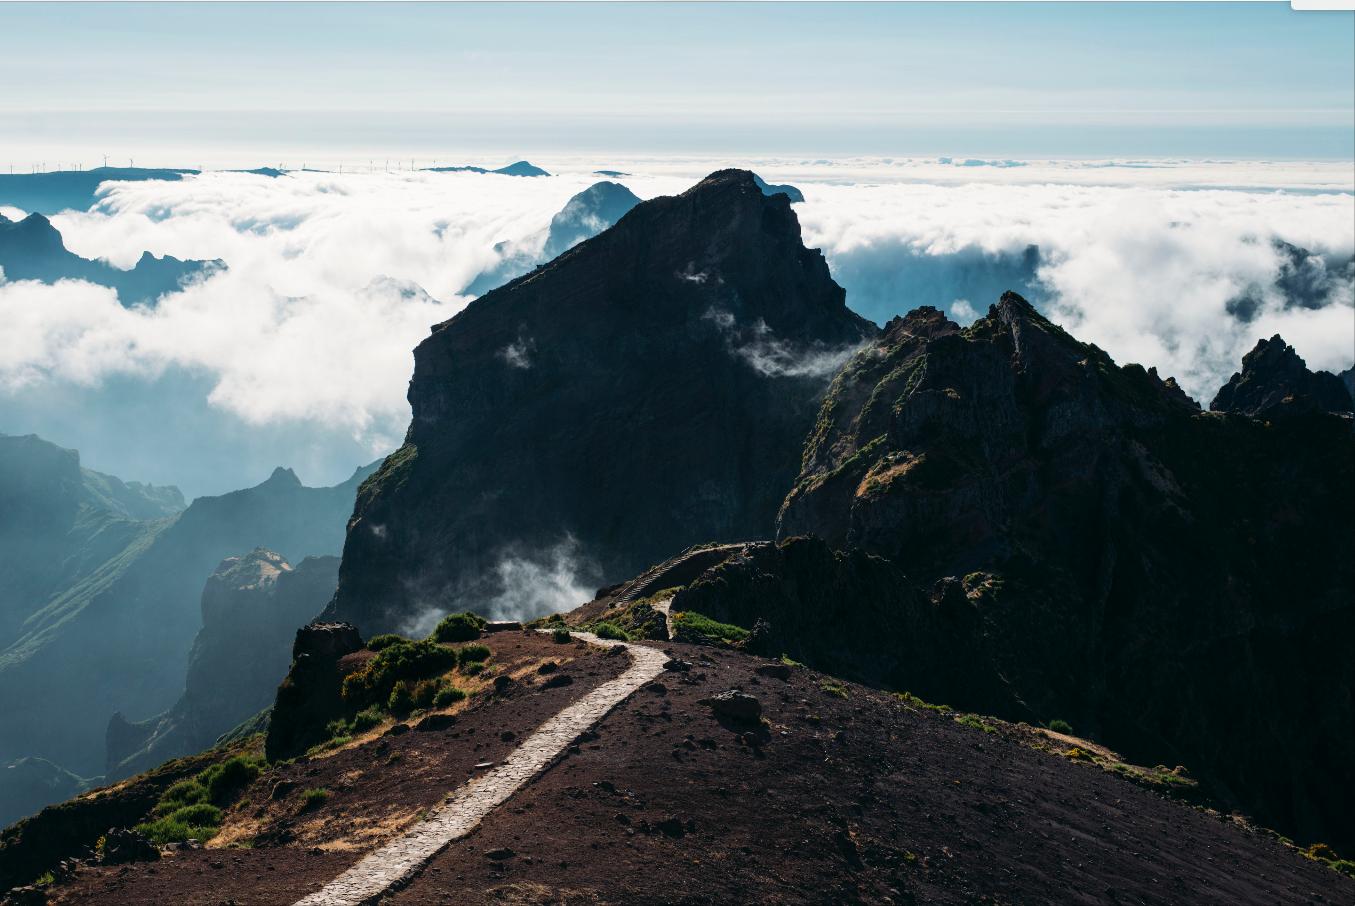 O Pico Ruivo